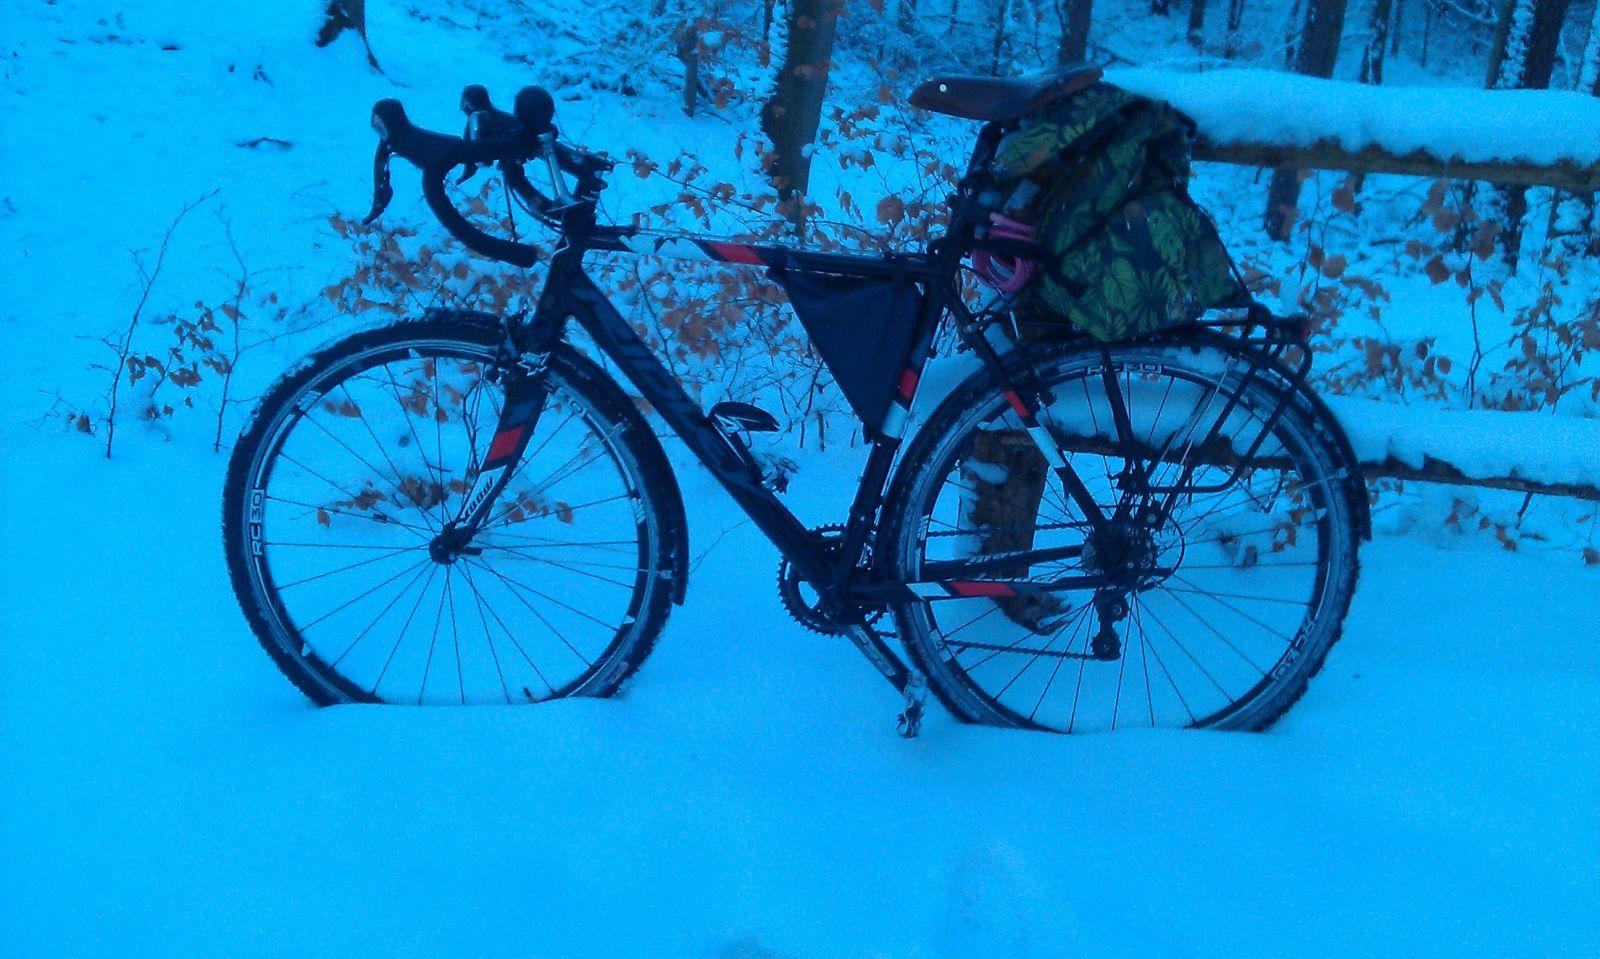 RIdley X-bow zimą 2.